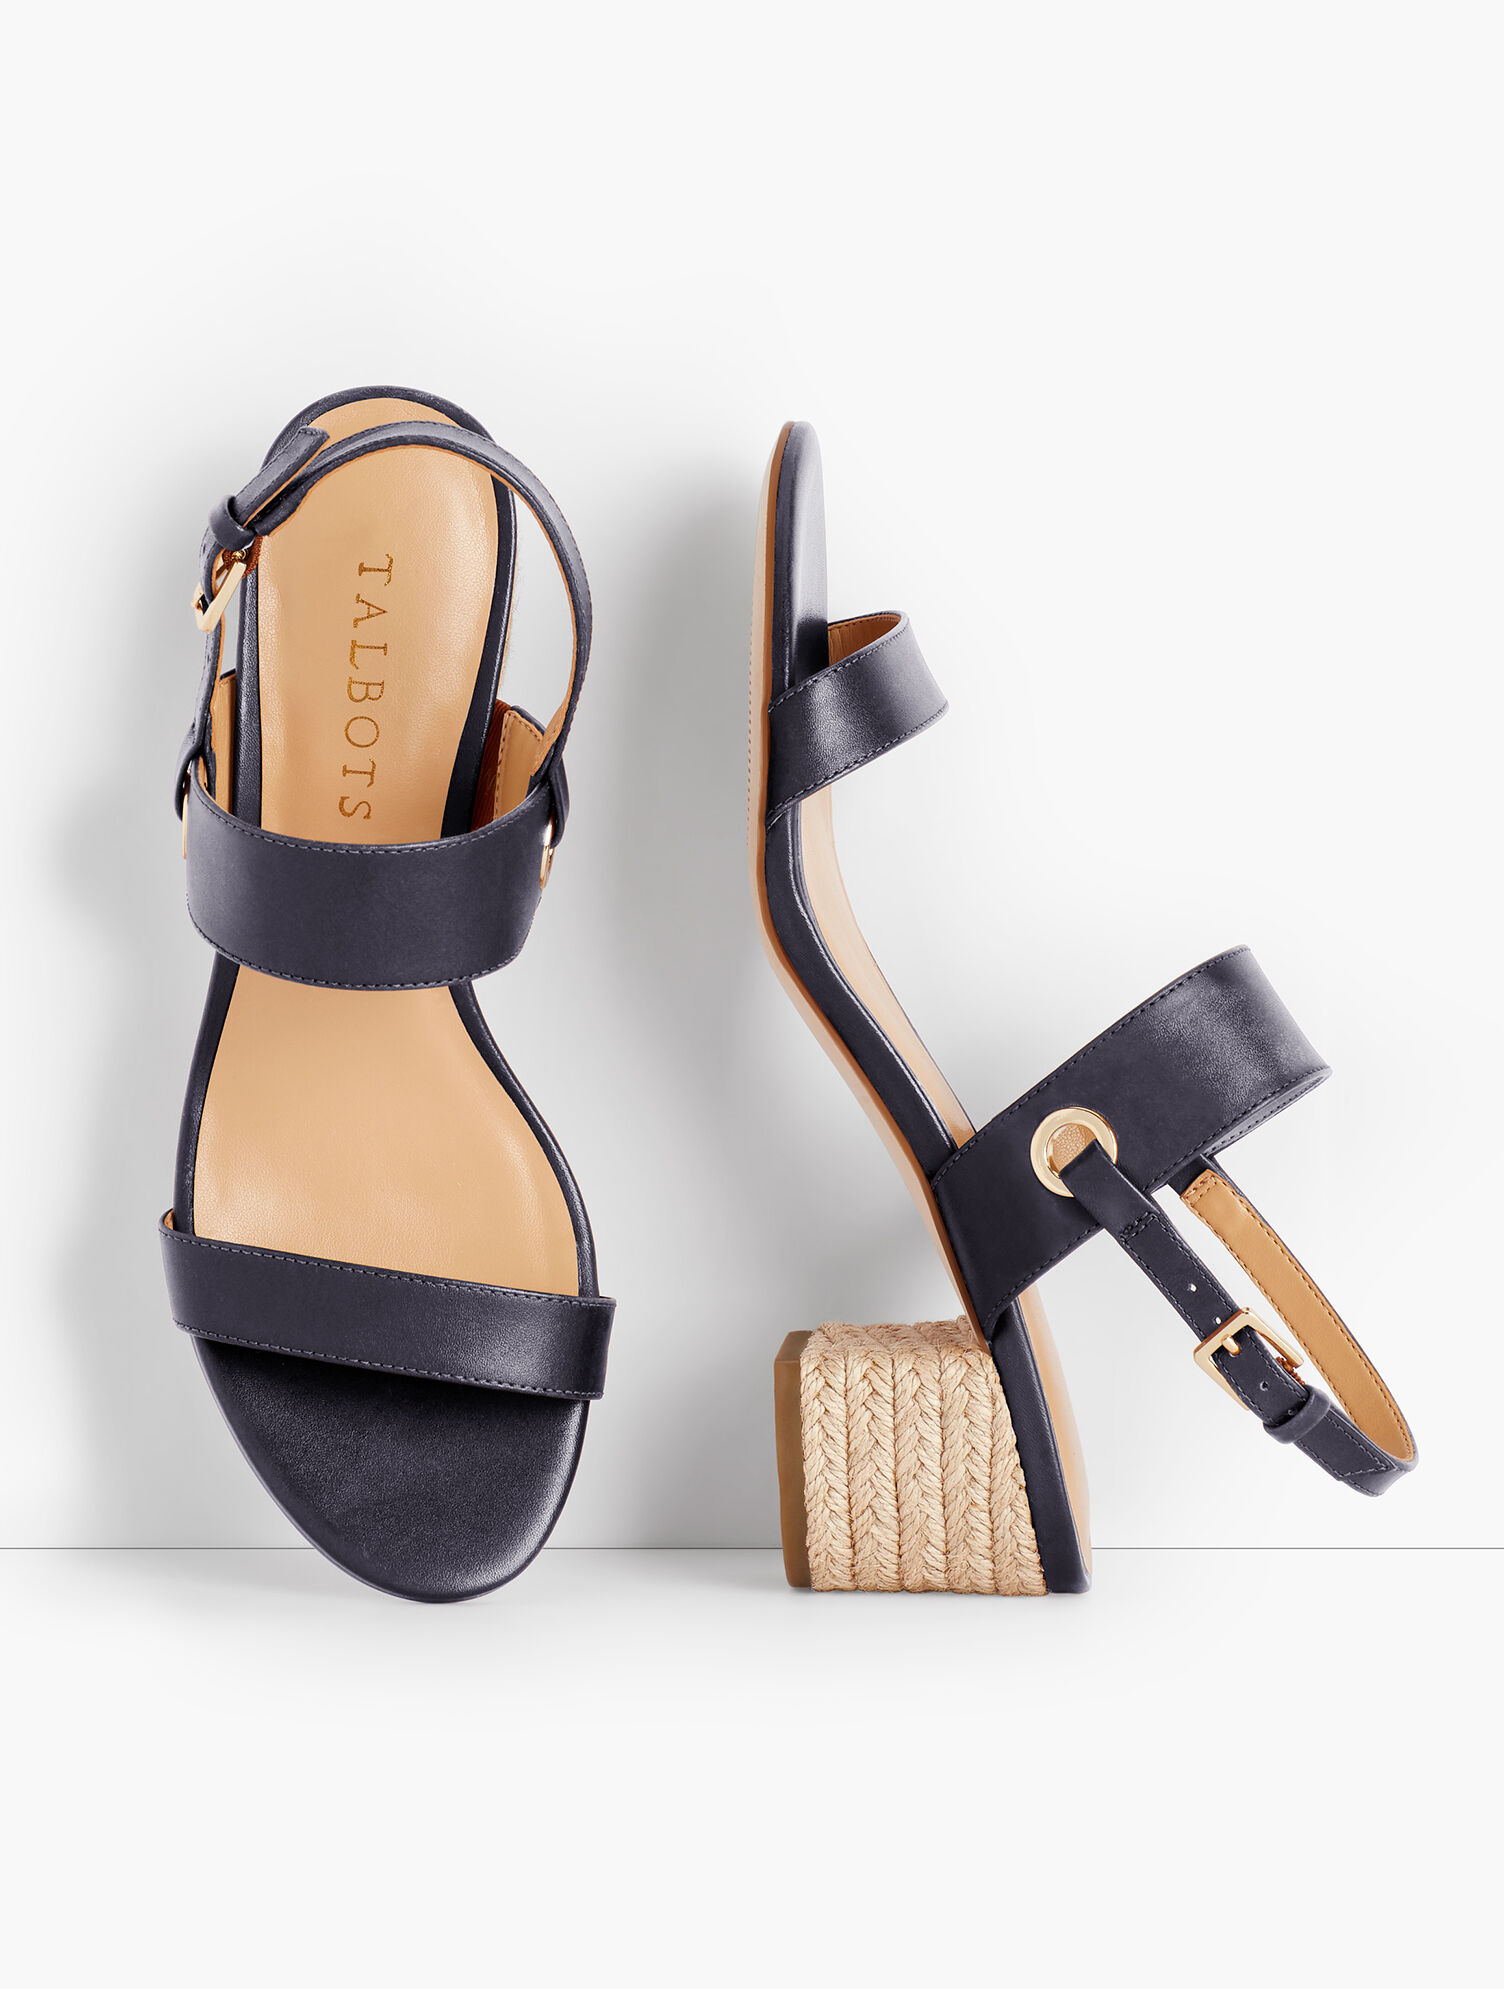 Mimi Rope Heel Sandals - Vachetta